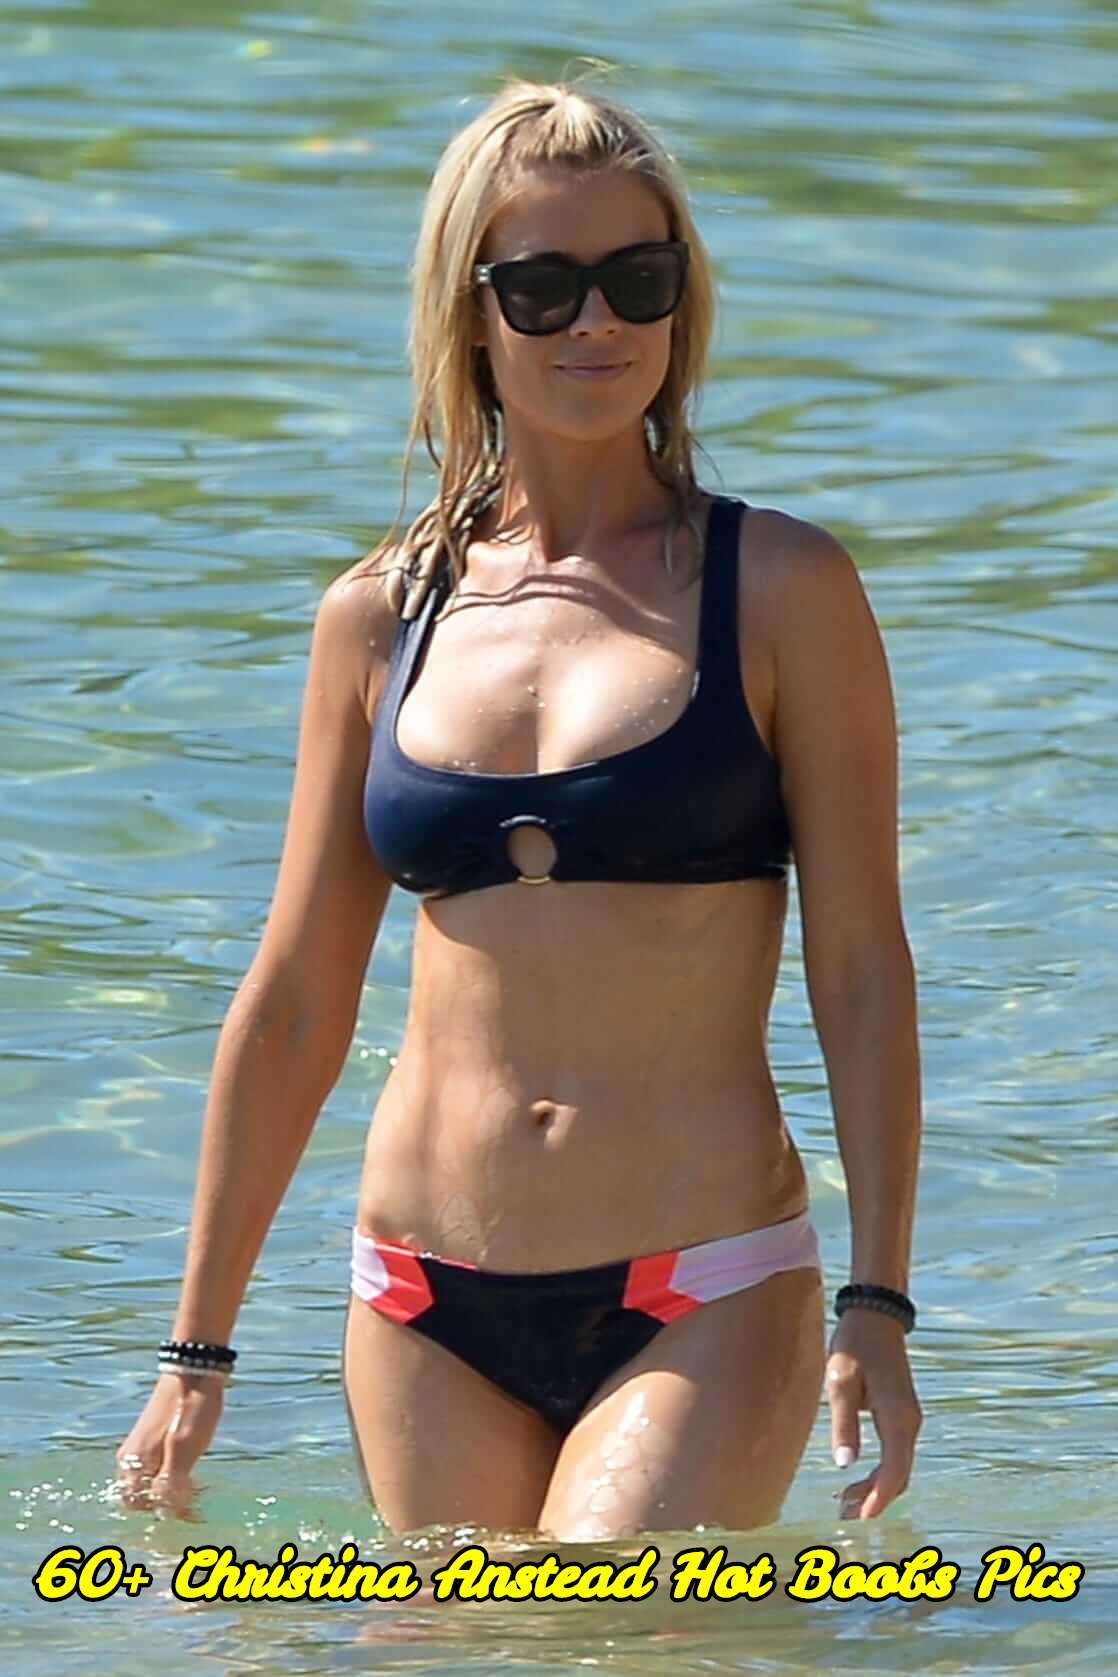 Christina Anstead hot boobs pics